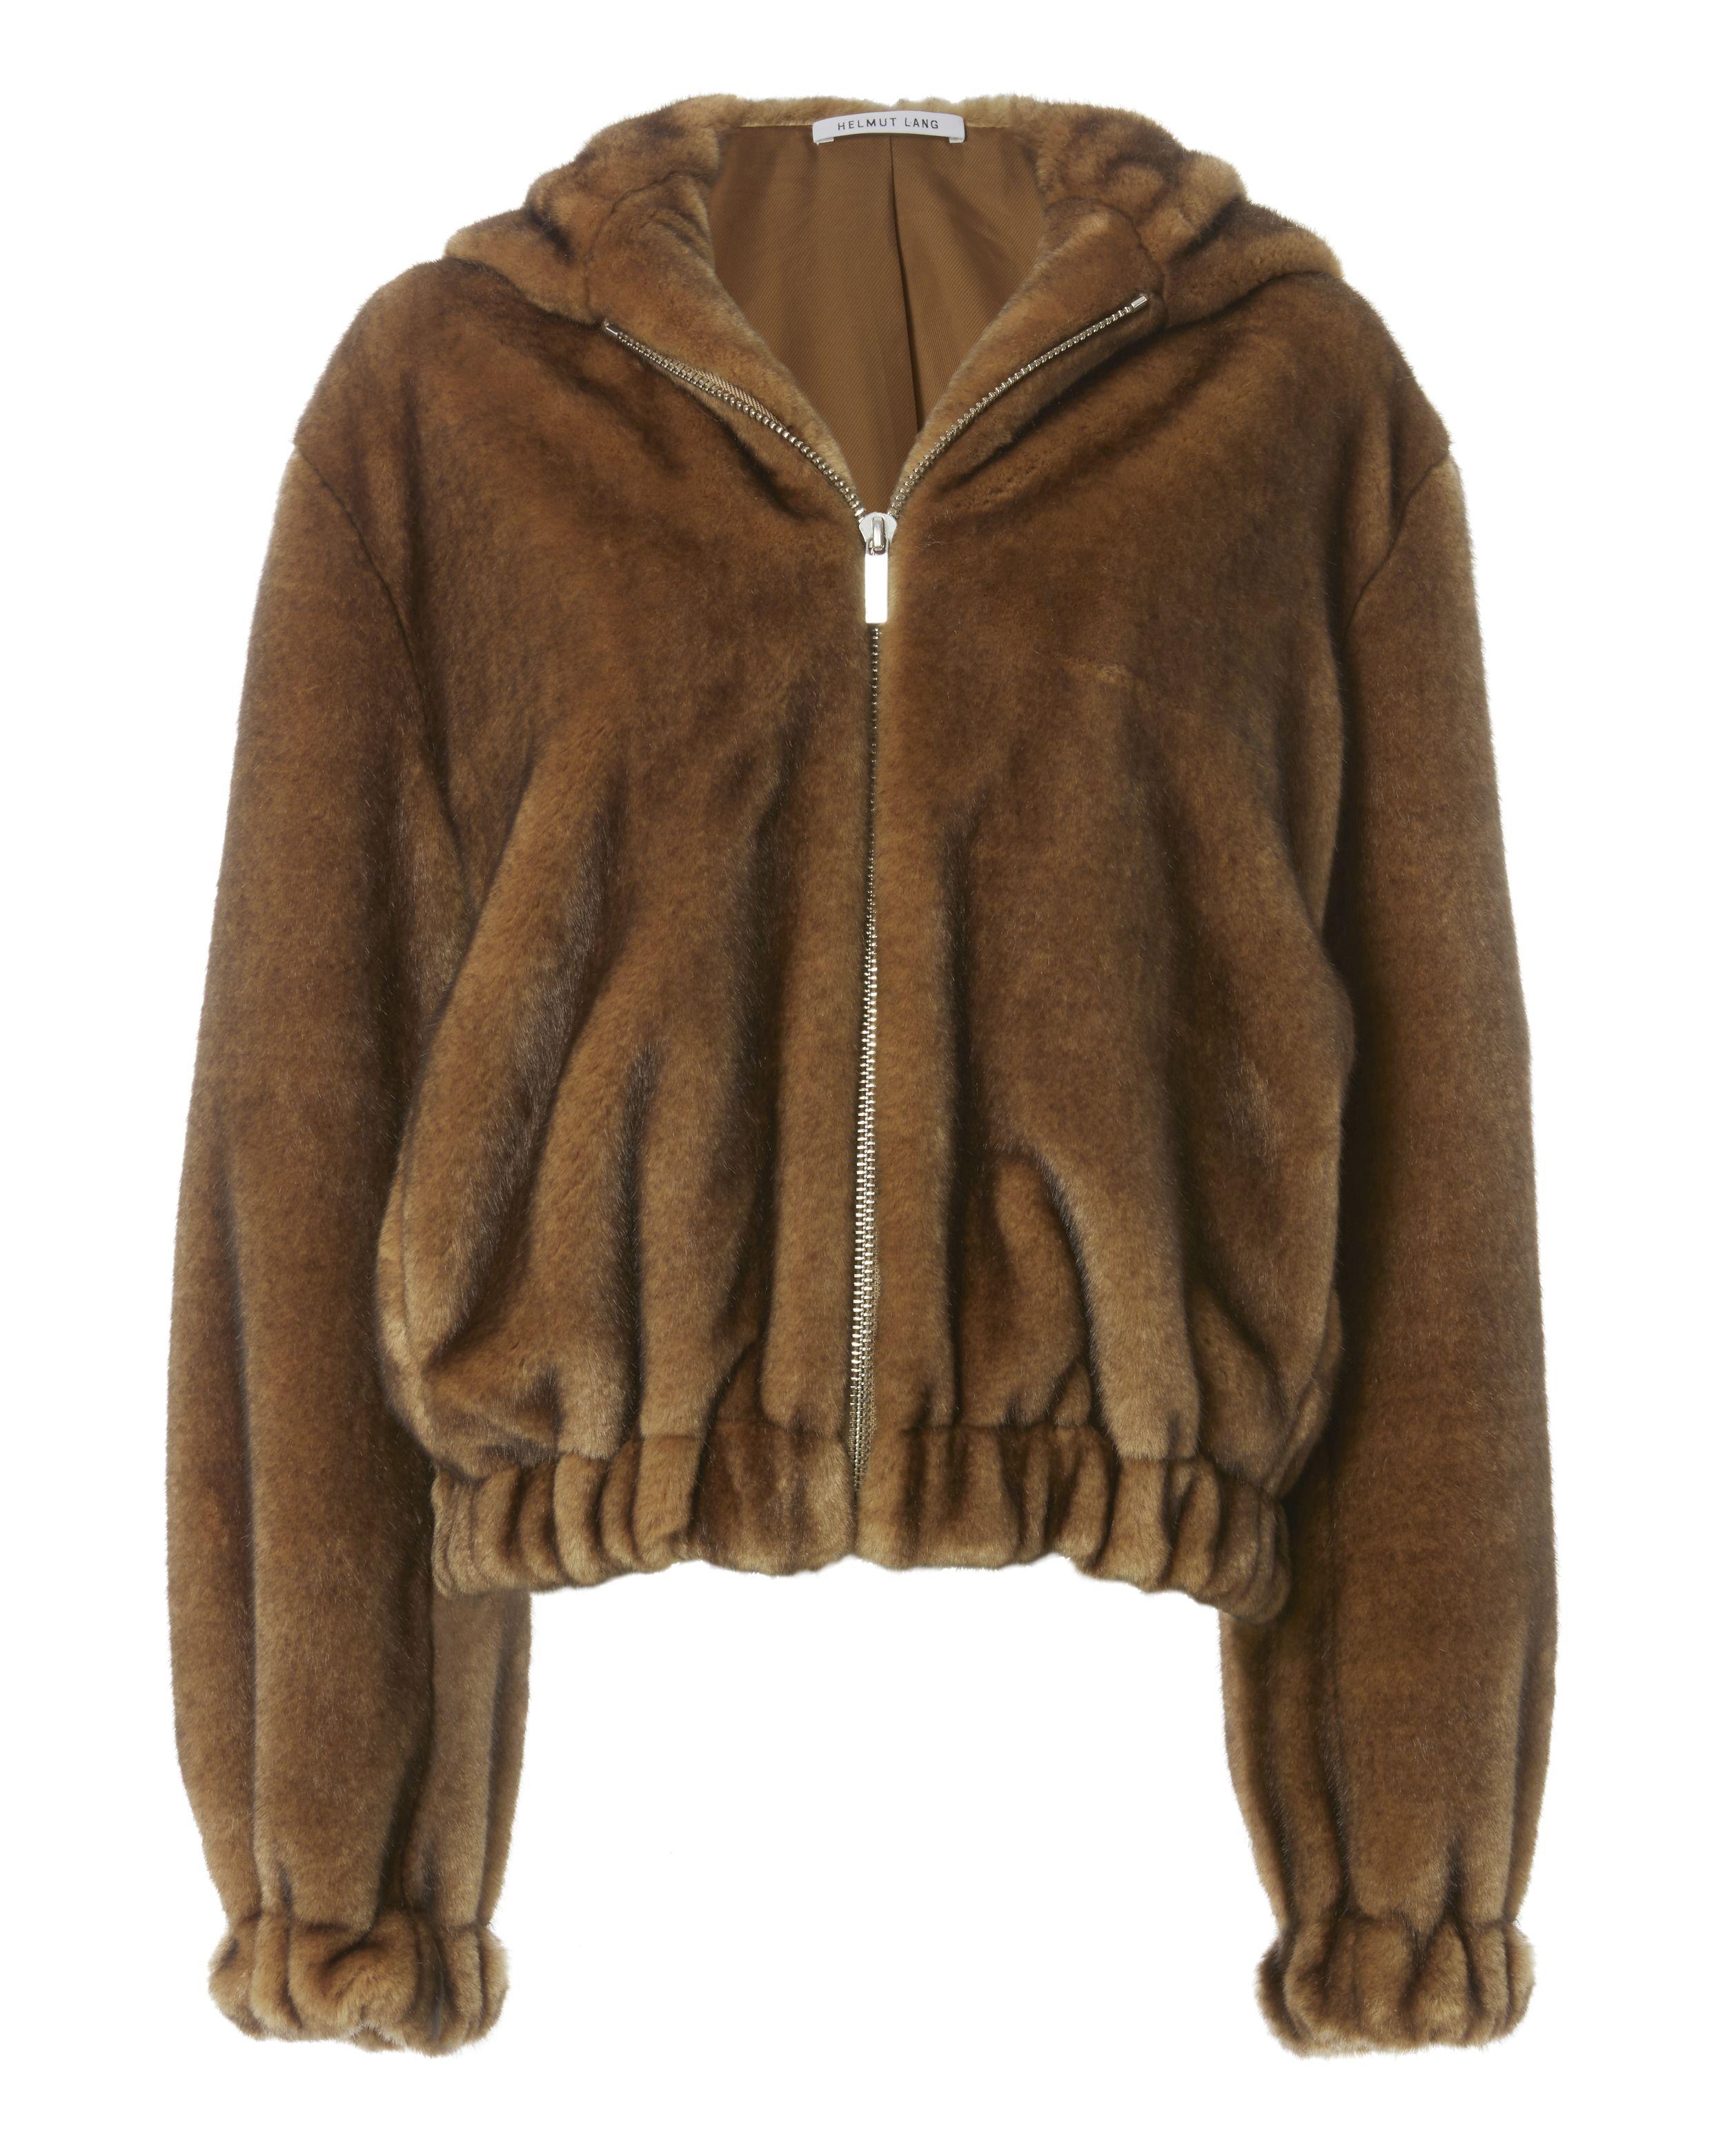 Faux Fur Hooded Bomber Jacket Faux leather bomber jacket